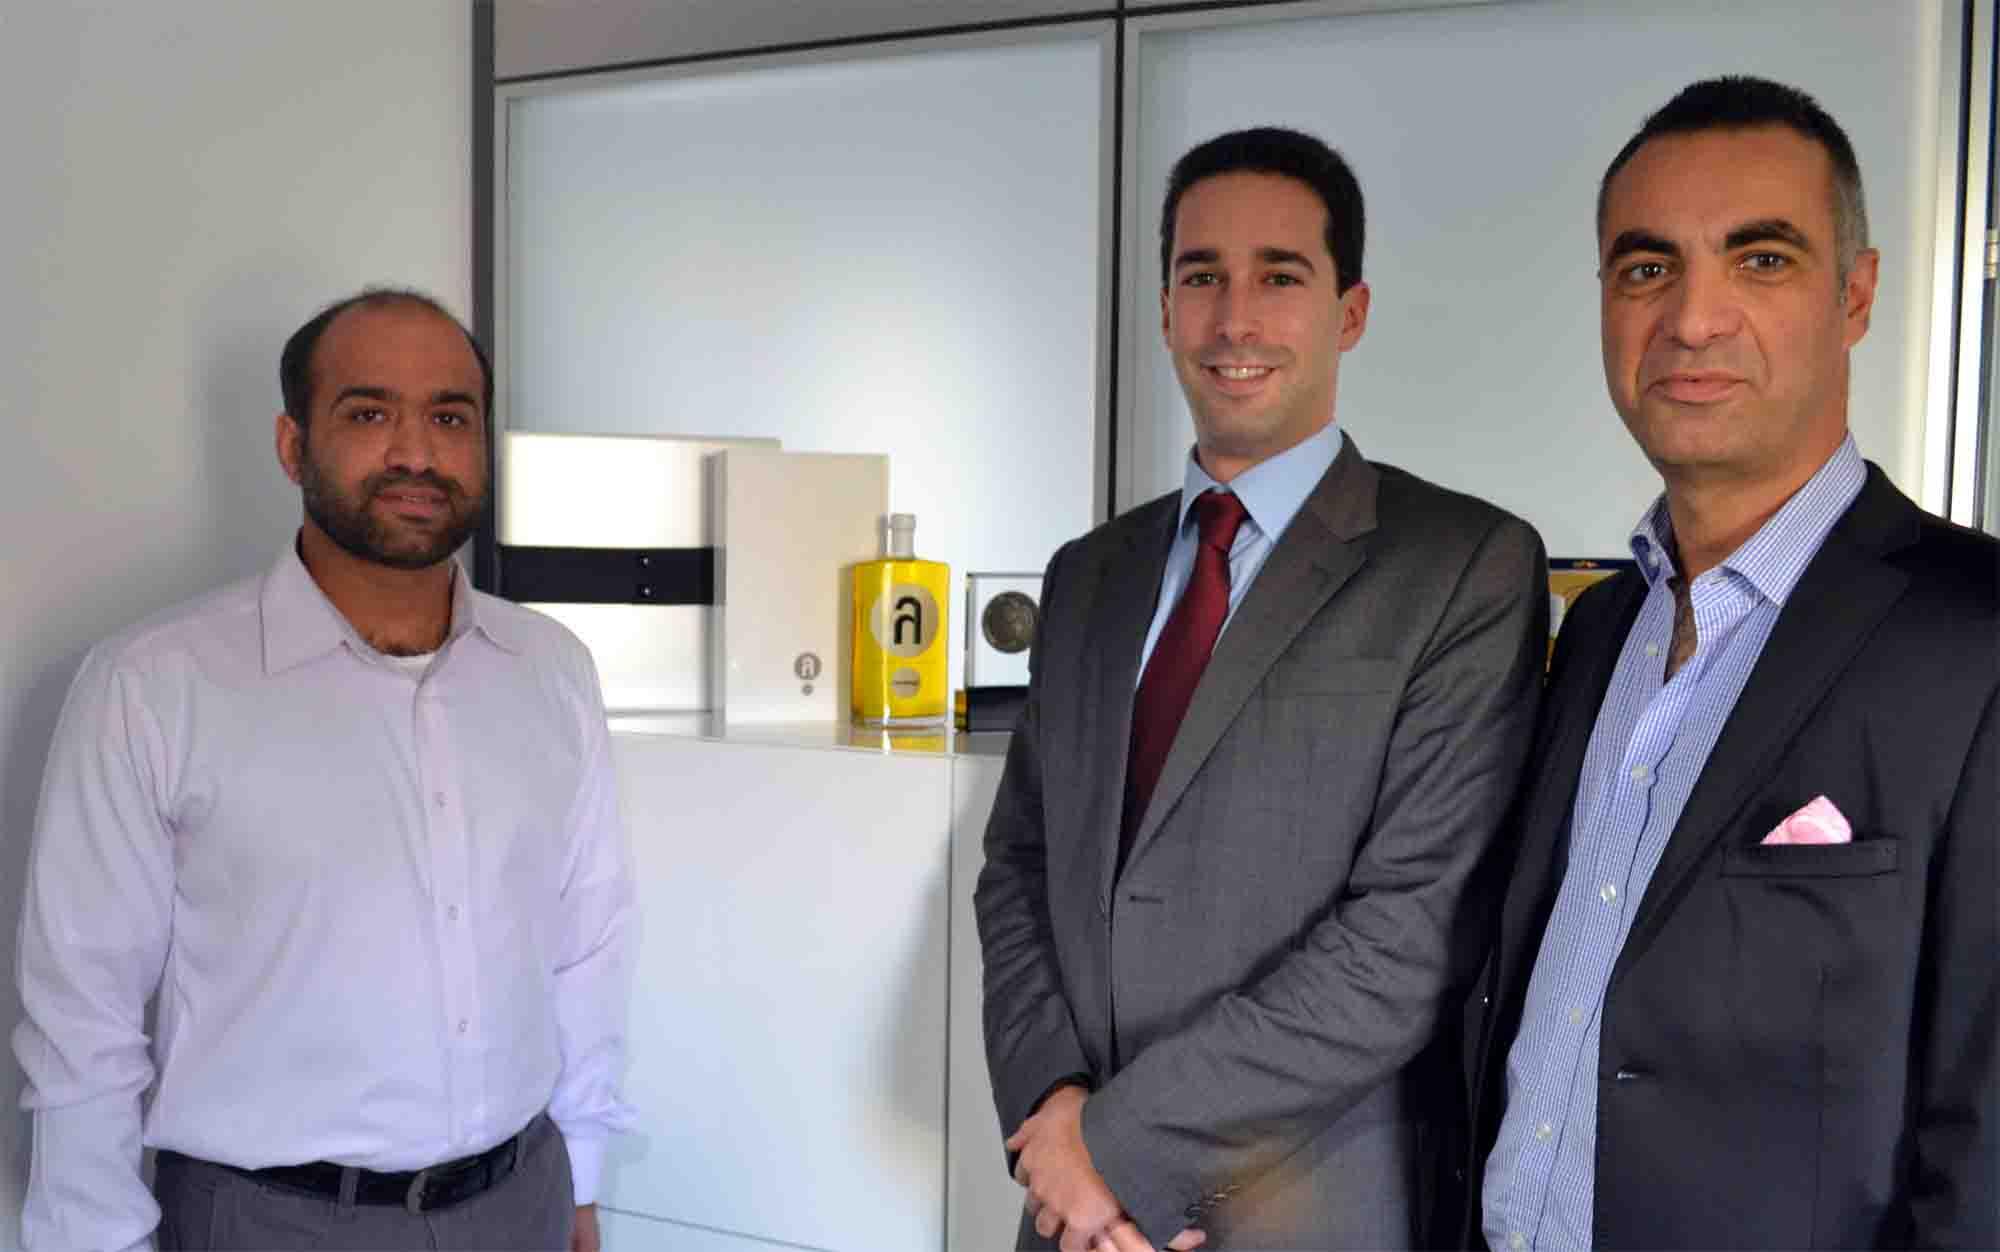 Mr. Al Kaabi of Majestic, Mr. Lyginos & Mr. Kolliopoulos of Speiron (l-r)